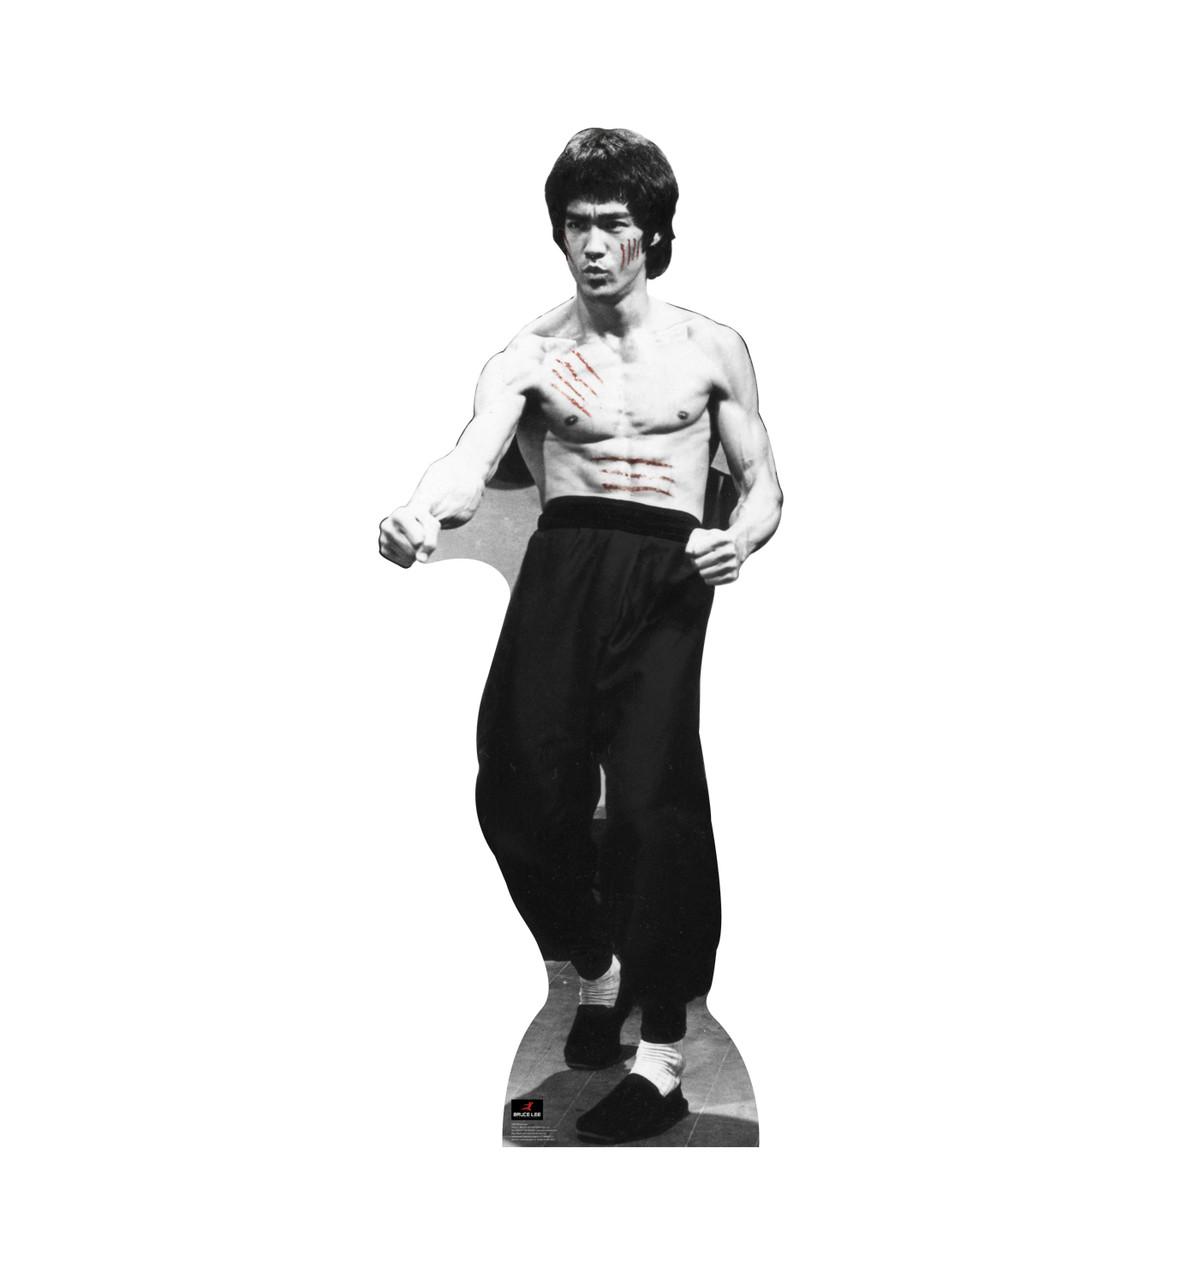 Bruce Lee Cut Cardboard Cutout 1042